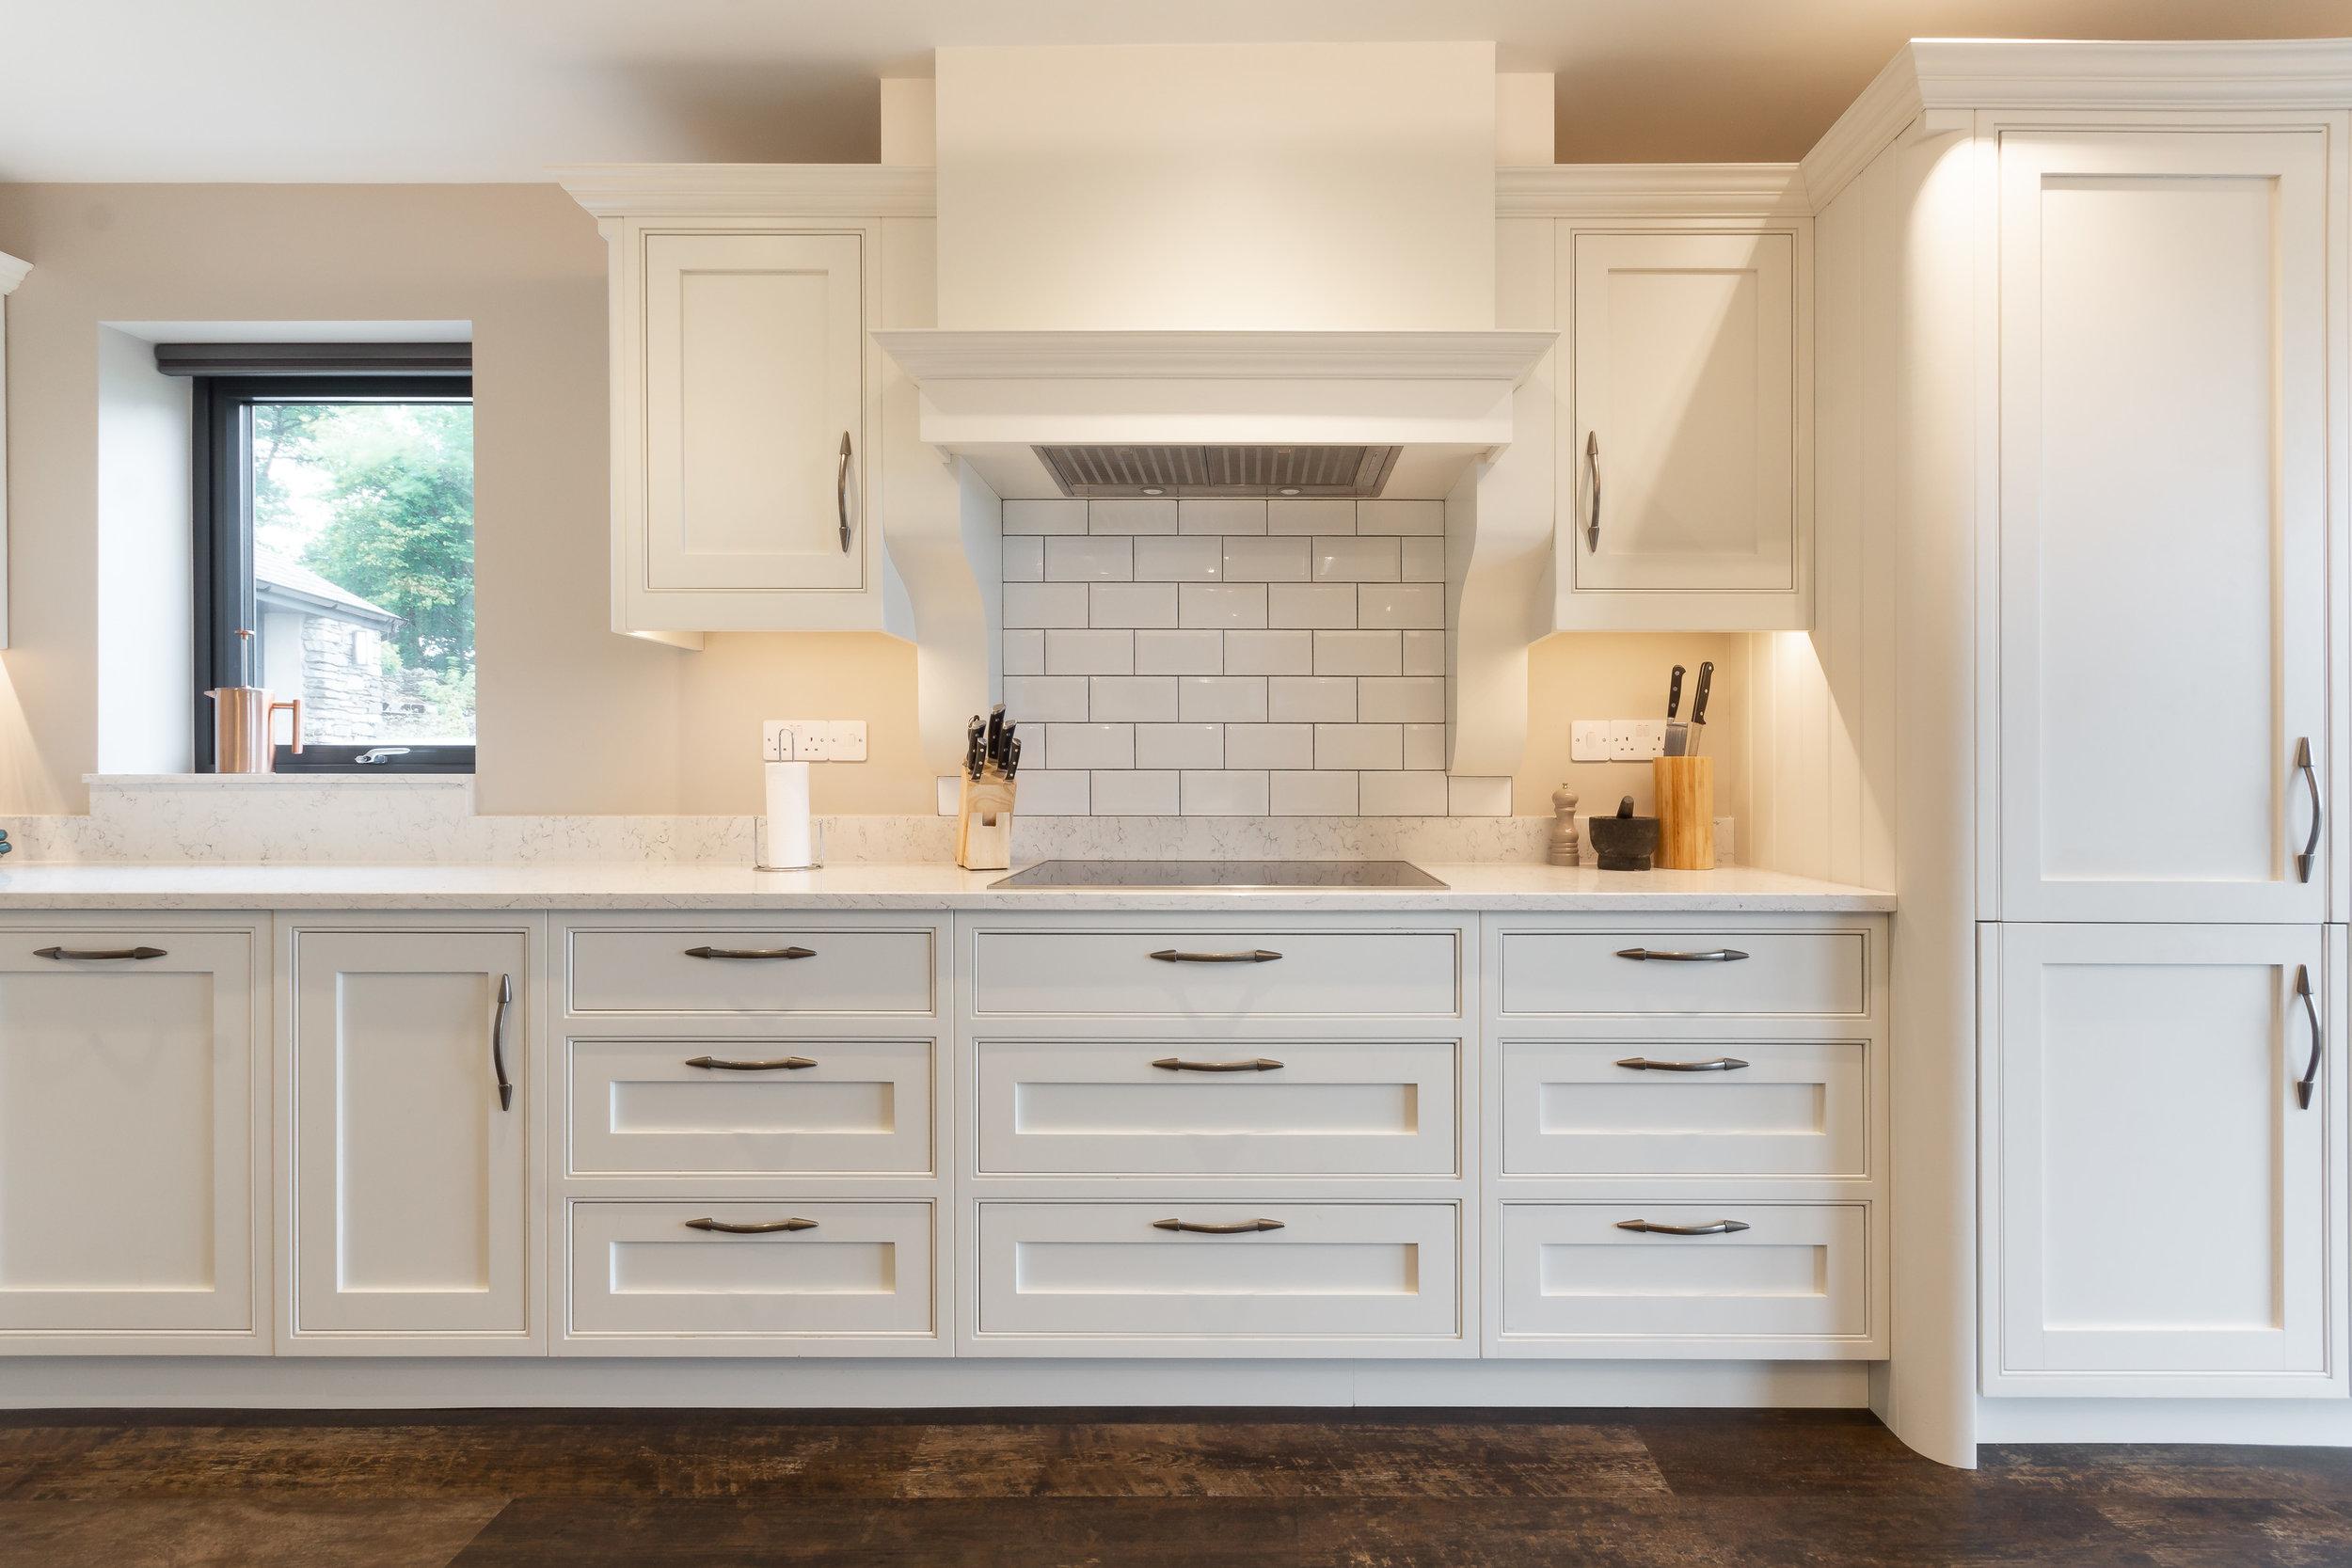 Webbs-Kitchens-Aimee-Curtin-00263.jpg